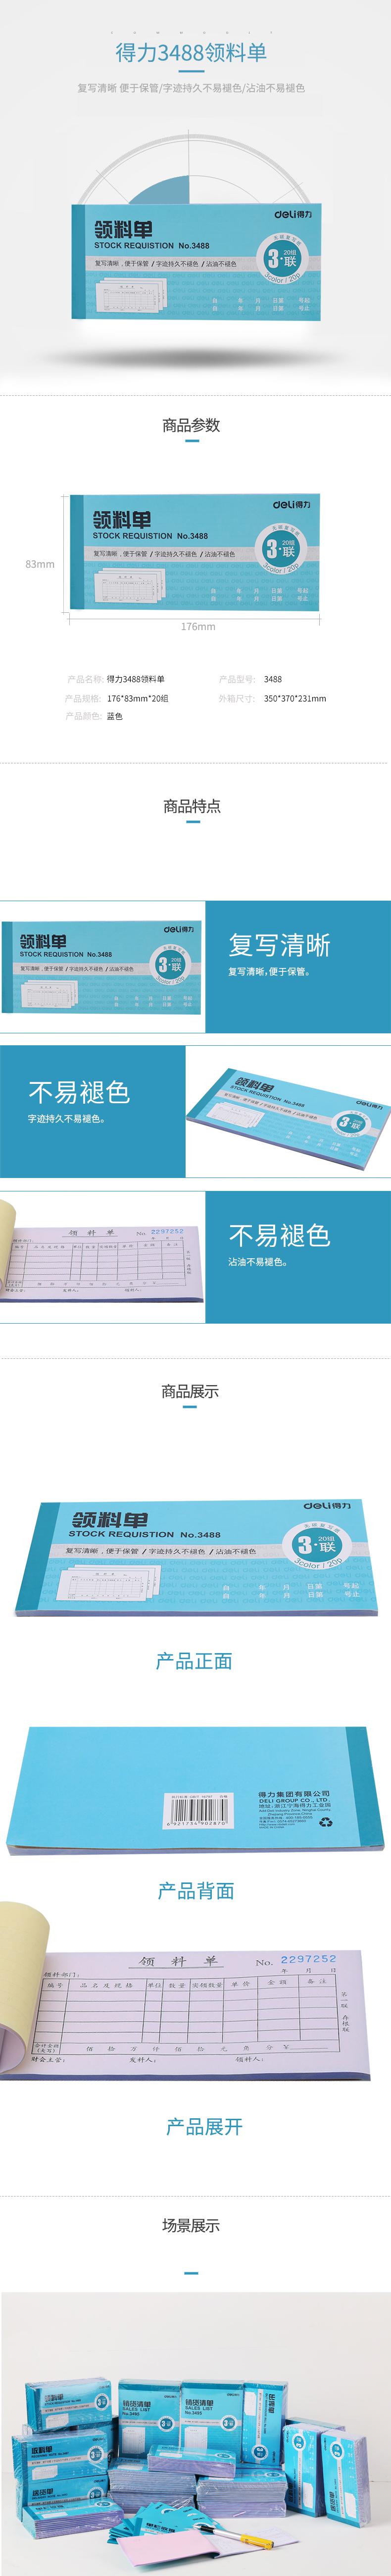 VWIN真人3488三联领料单(蓝)